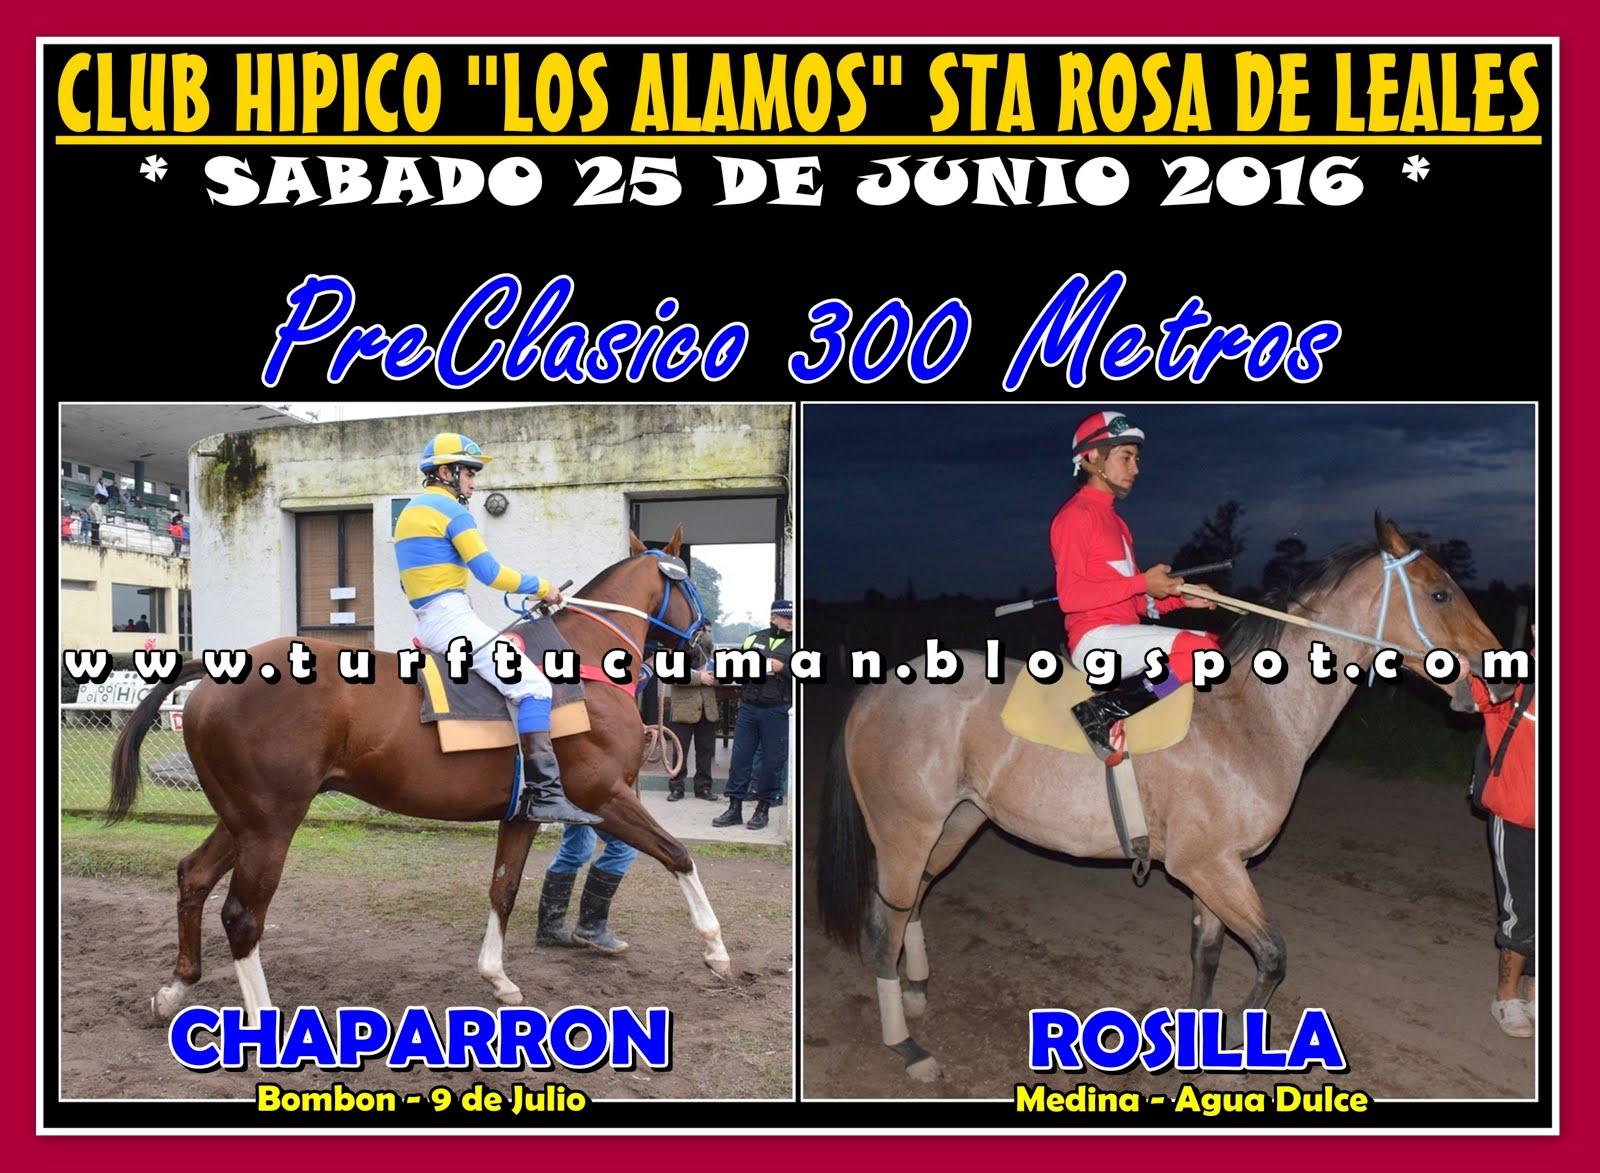 CHAPARRON VS ROSILLA